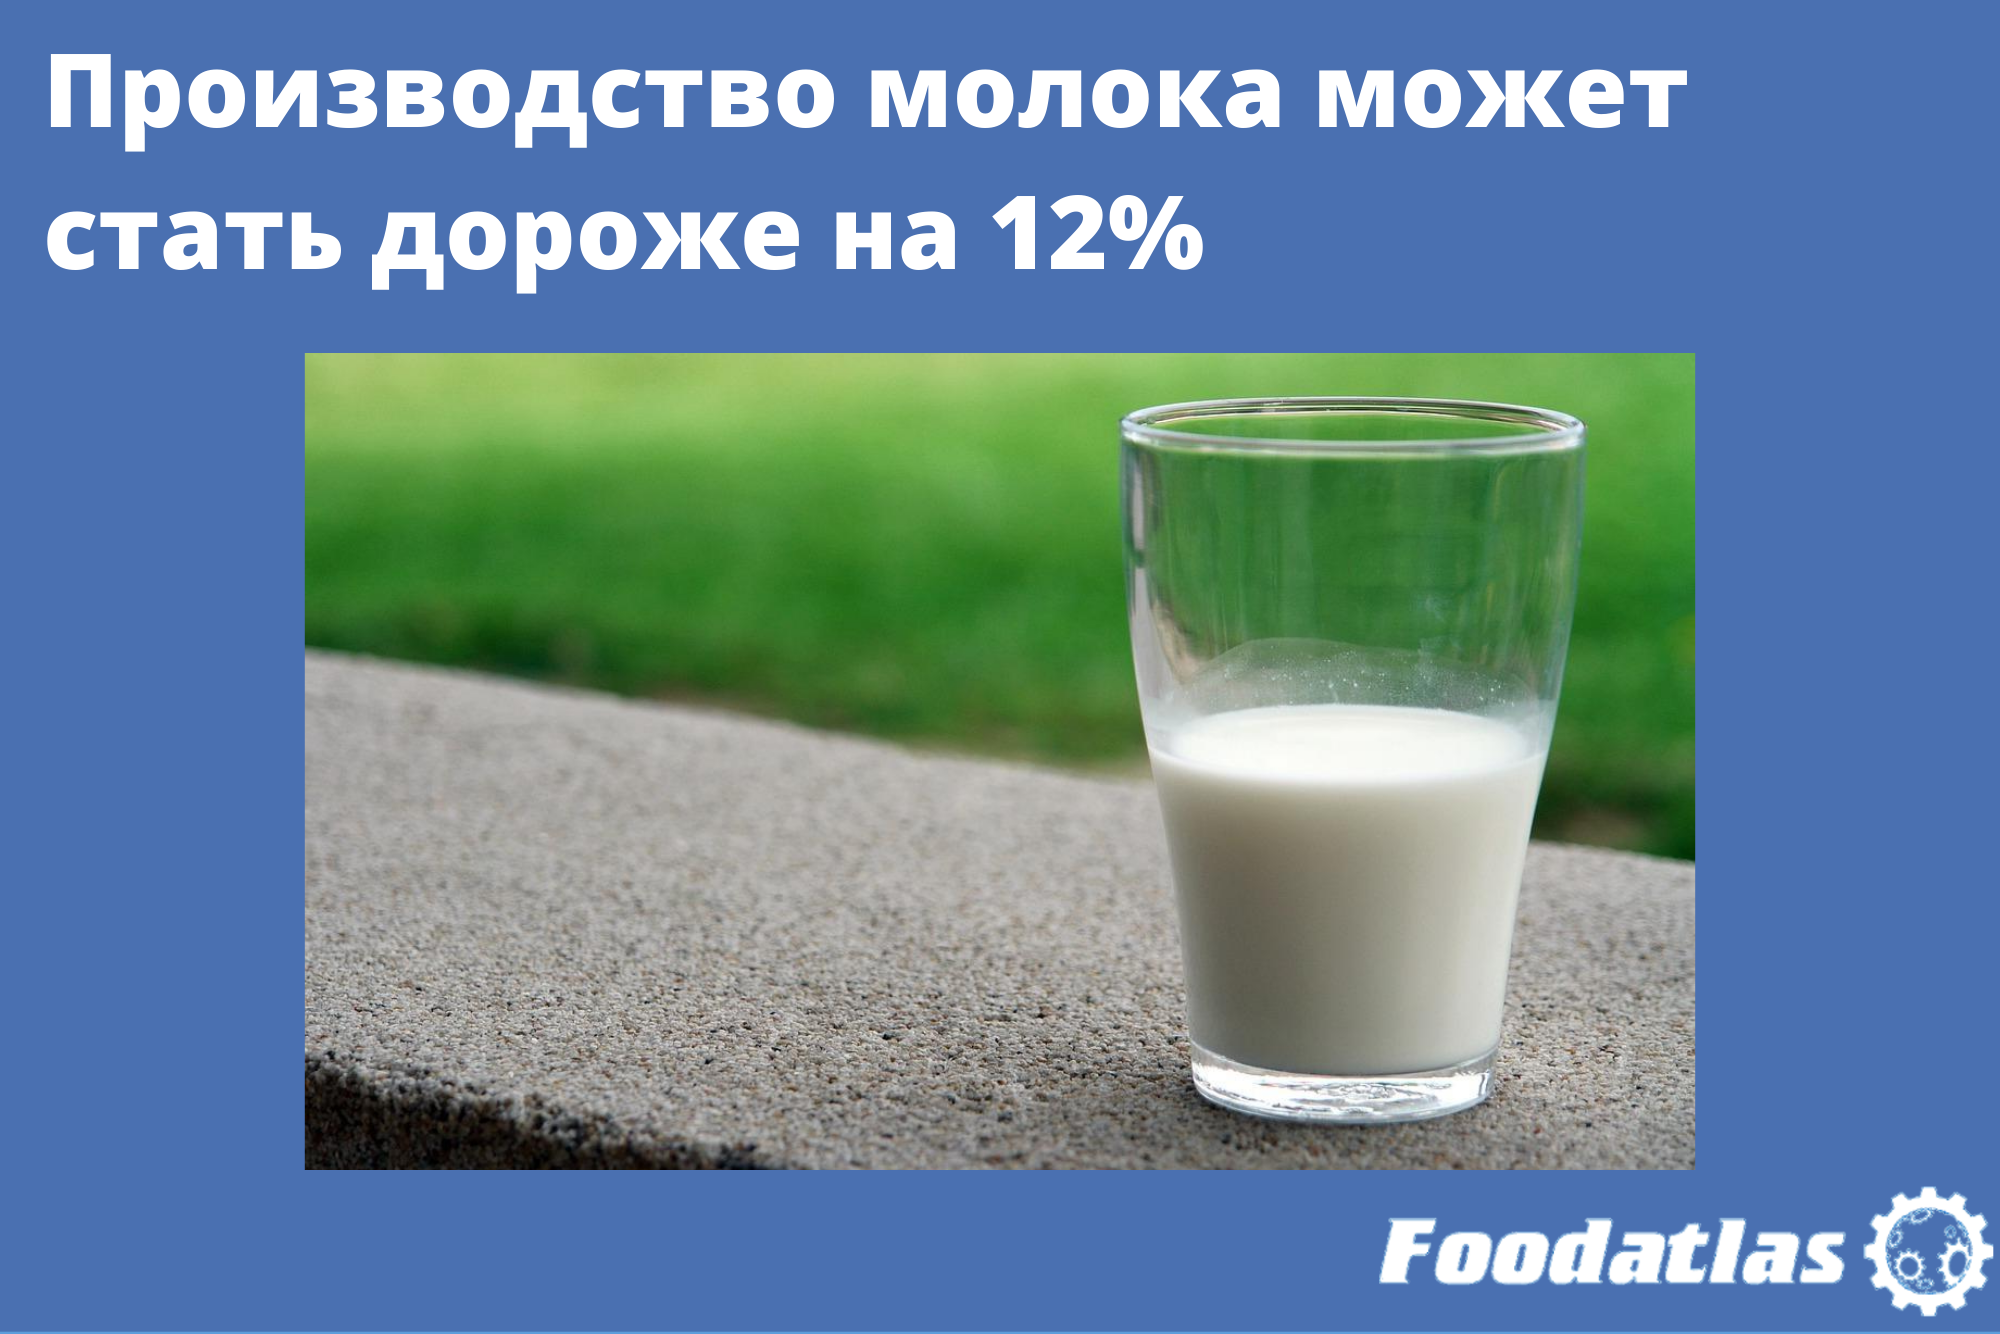 Производство молока может стать на 12% дороже